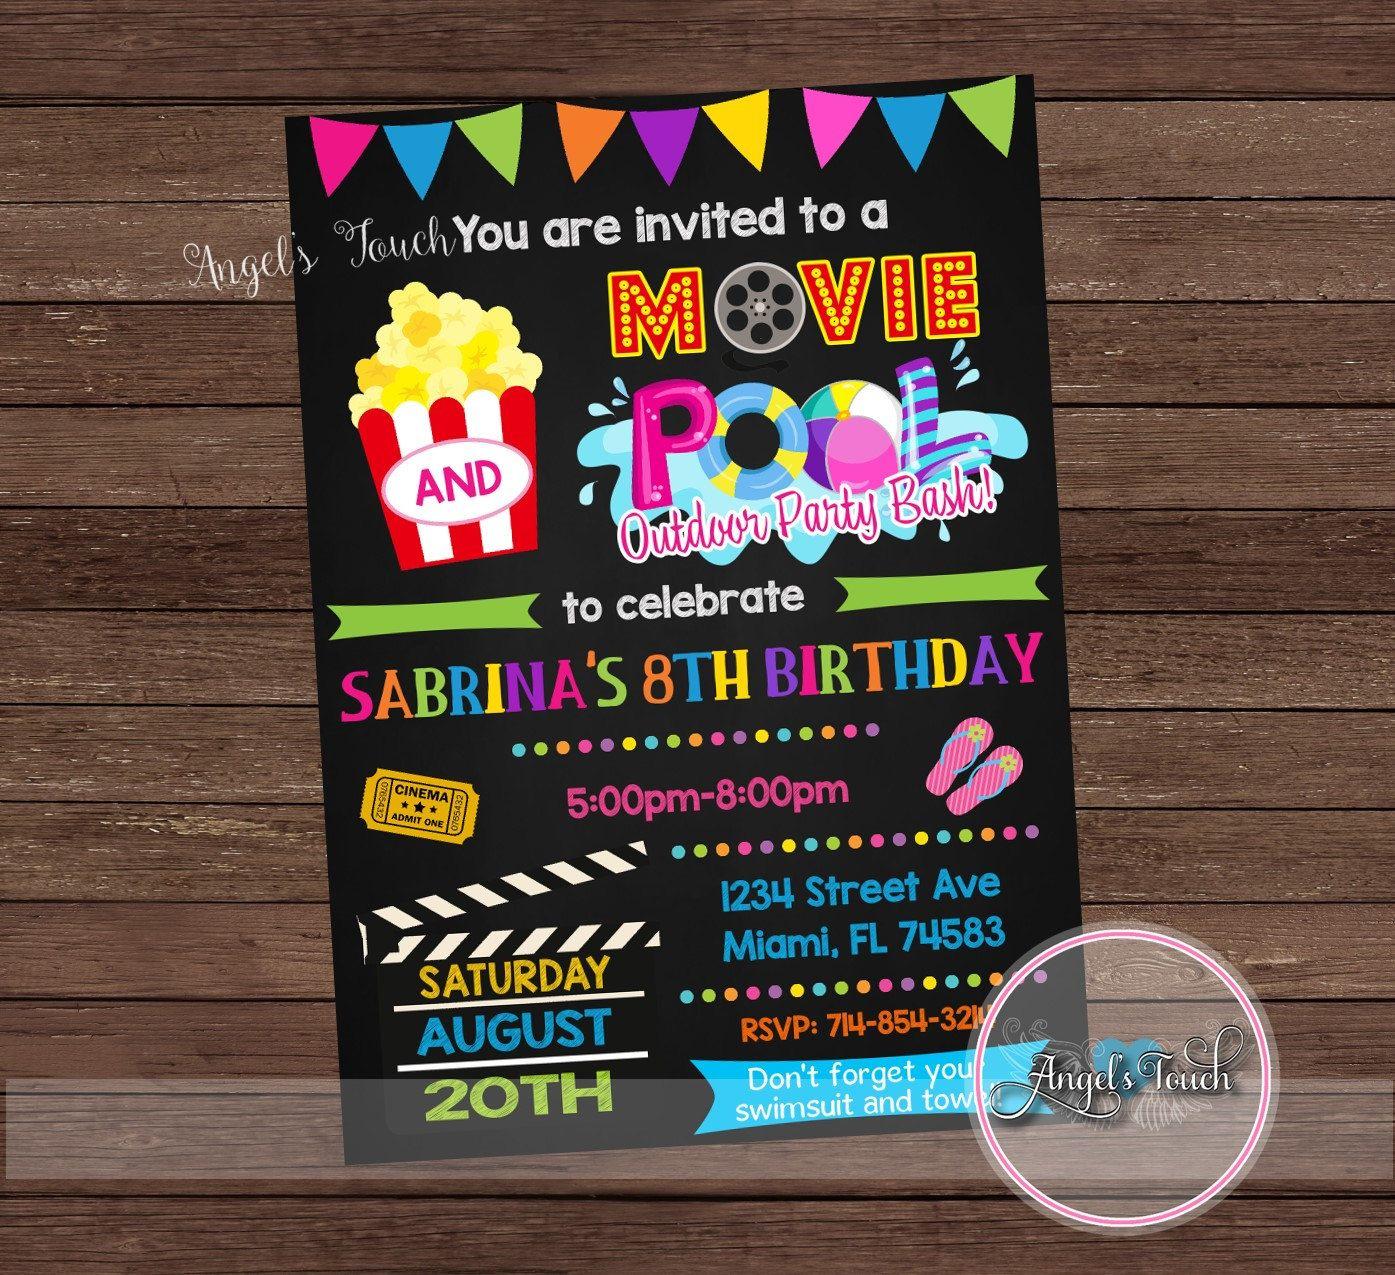 Movie And Pool Party Invitation Movie Night Party Invitation Etsy Movie Night Party Invitations Pool Party Invitations Movie Night Invitations